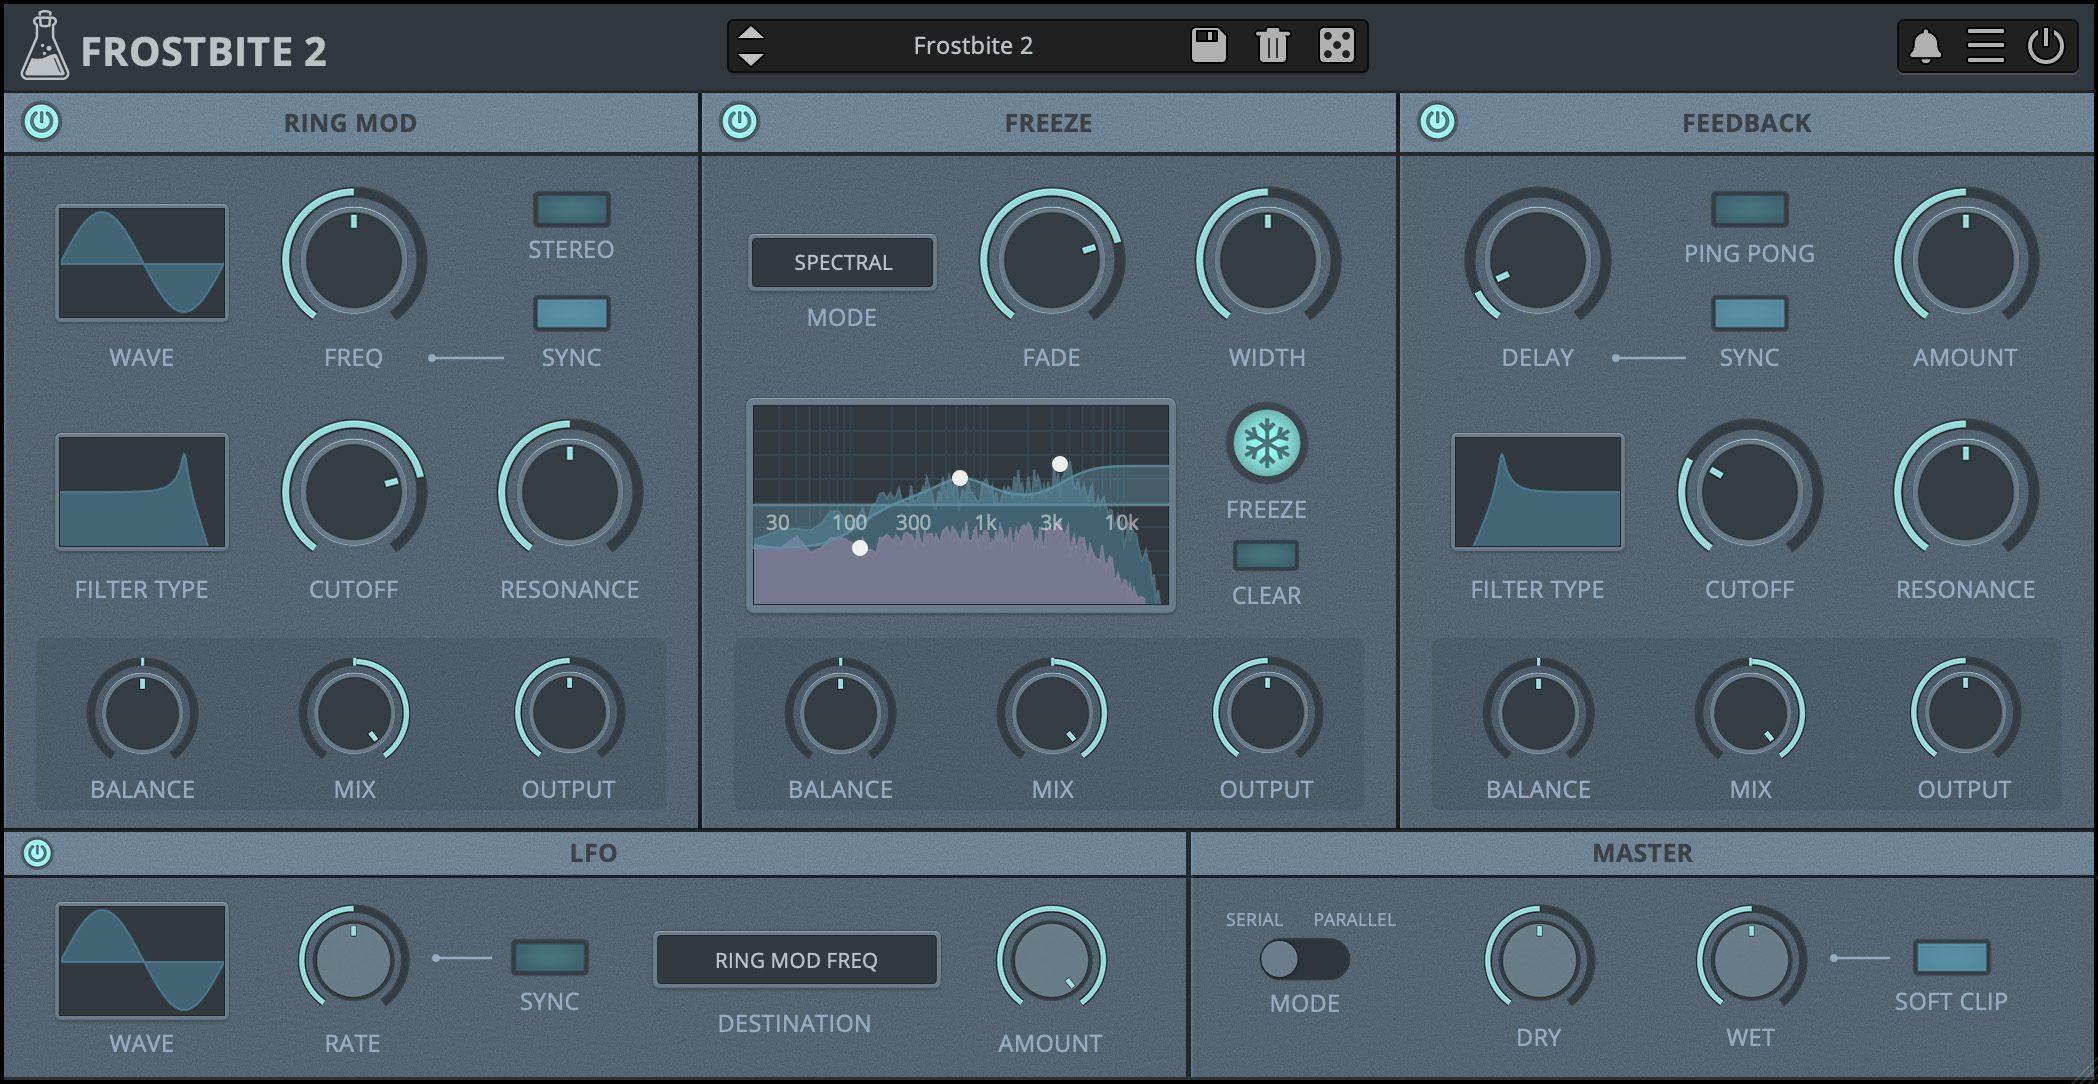 Frostbite 2 GUI 2x